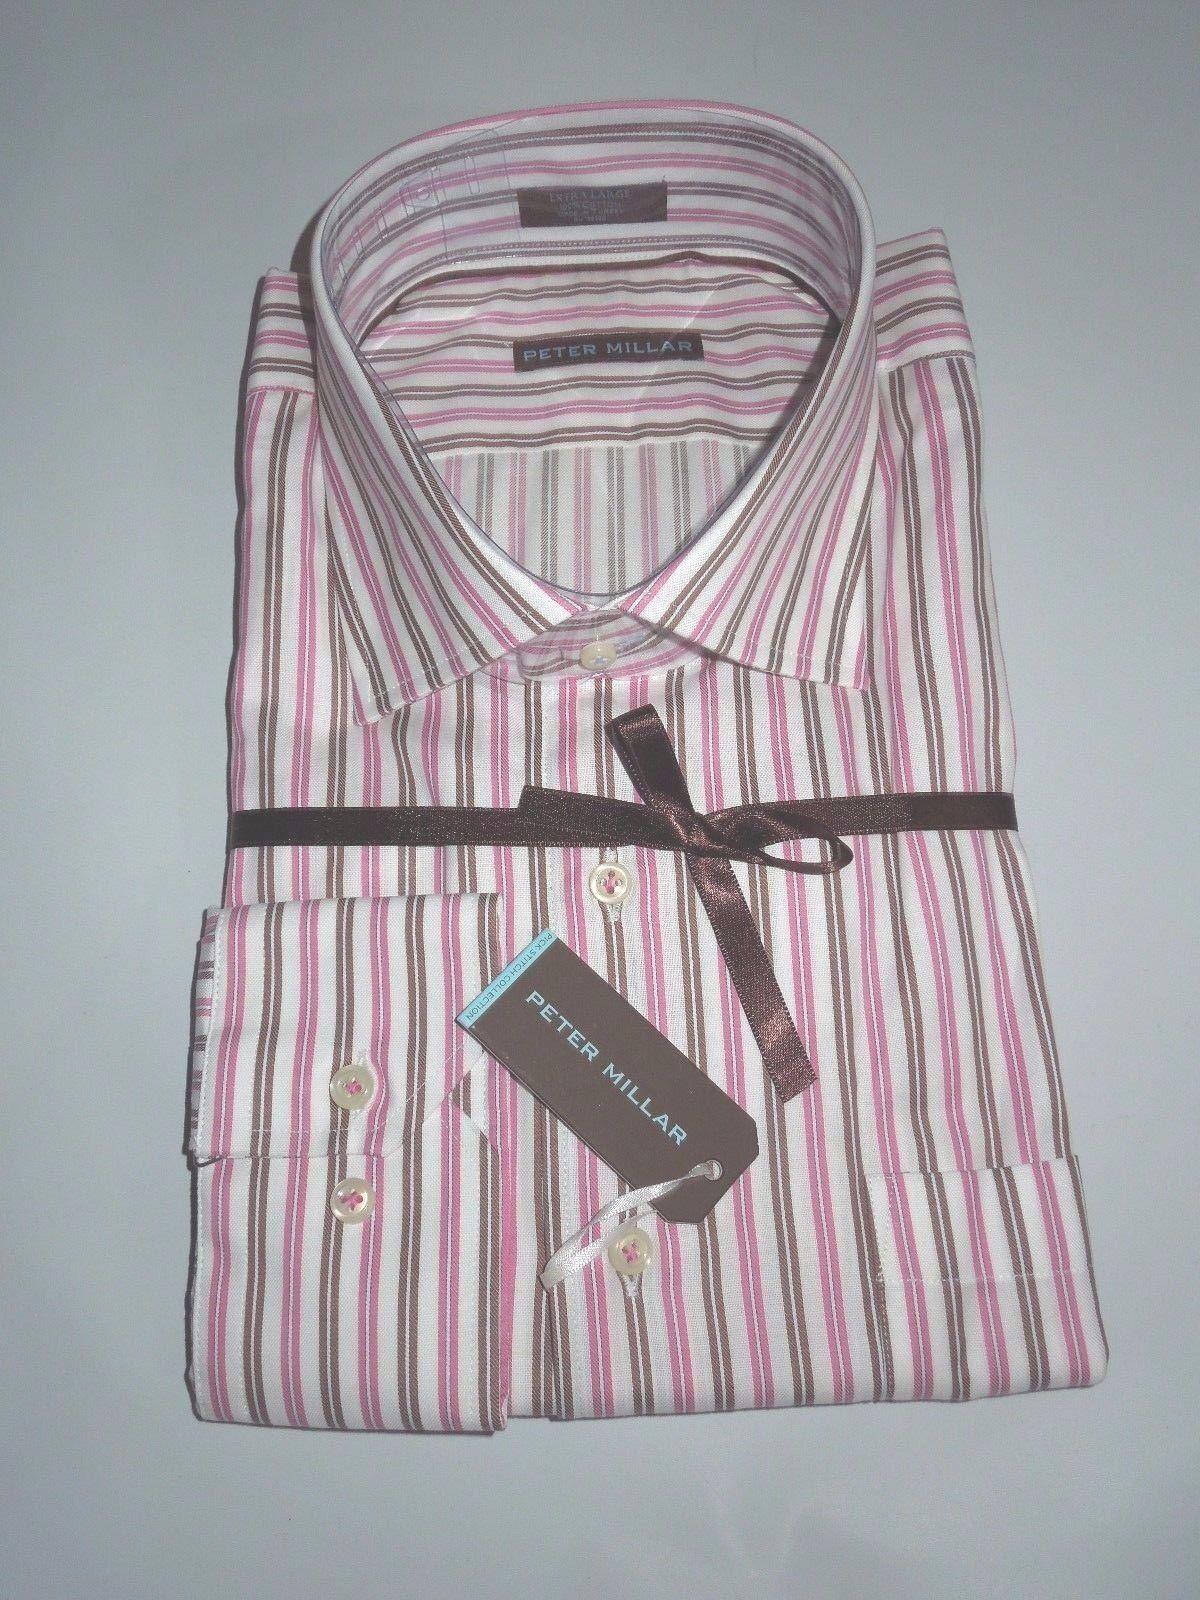 51b02194 New PETER MILLAR button down Dress SHIRT L Large Retail nsqbfi1848 ...